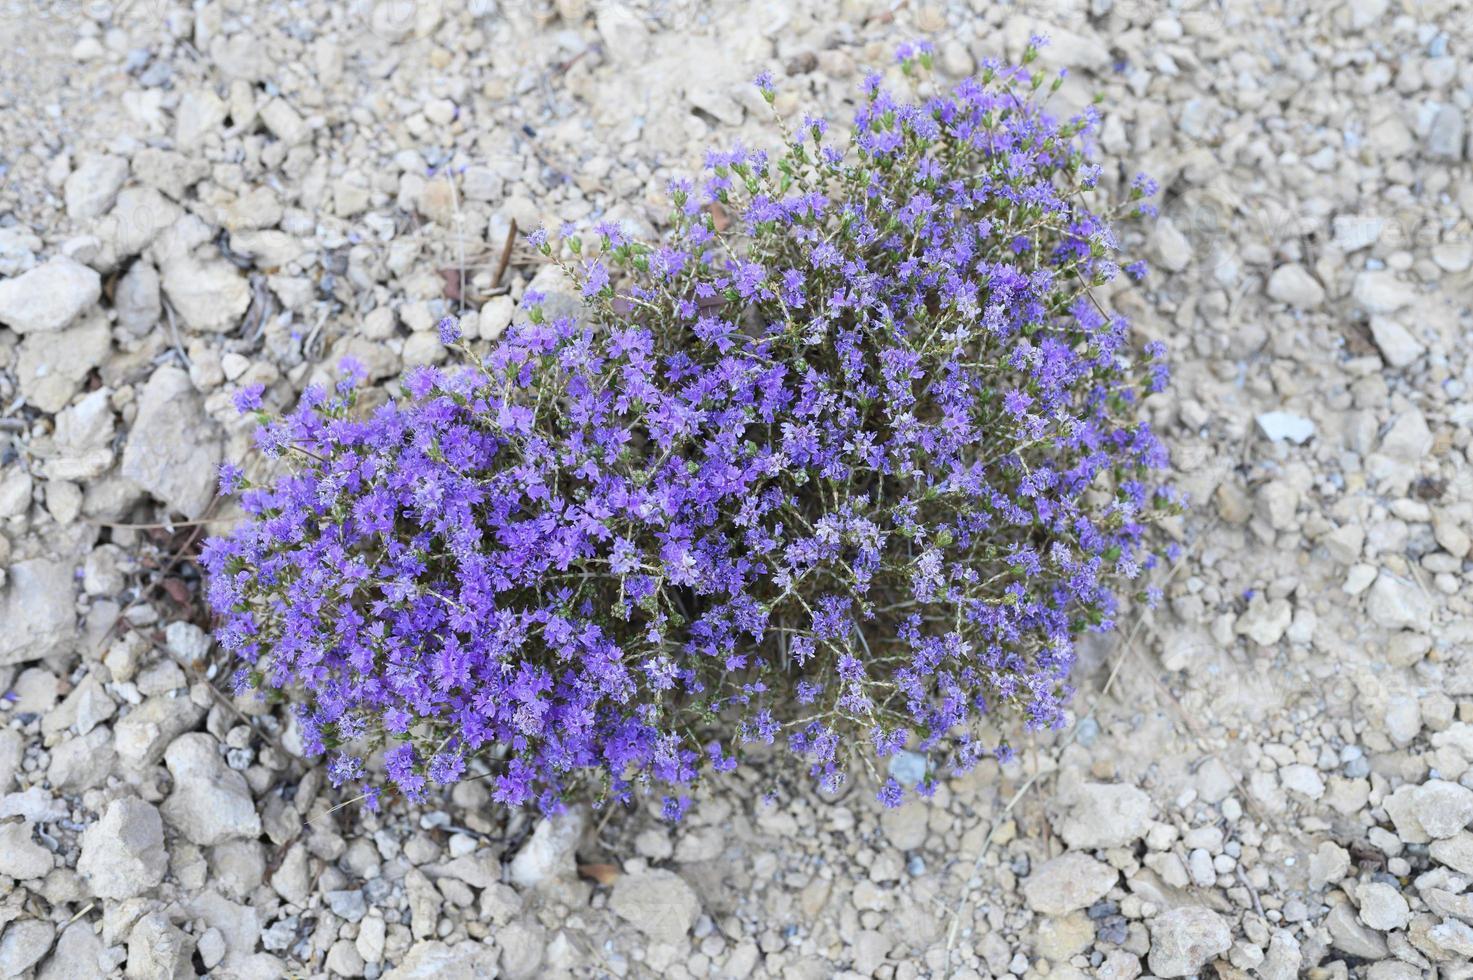 Mountain Greek wild thyme Bush blooming purple flowers among the stones photo